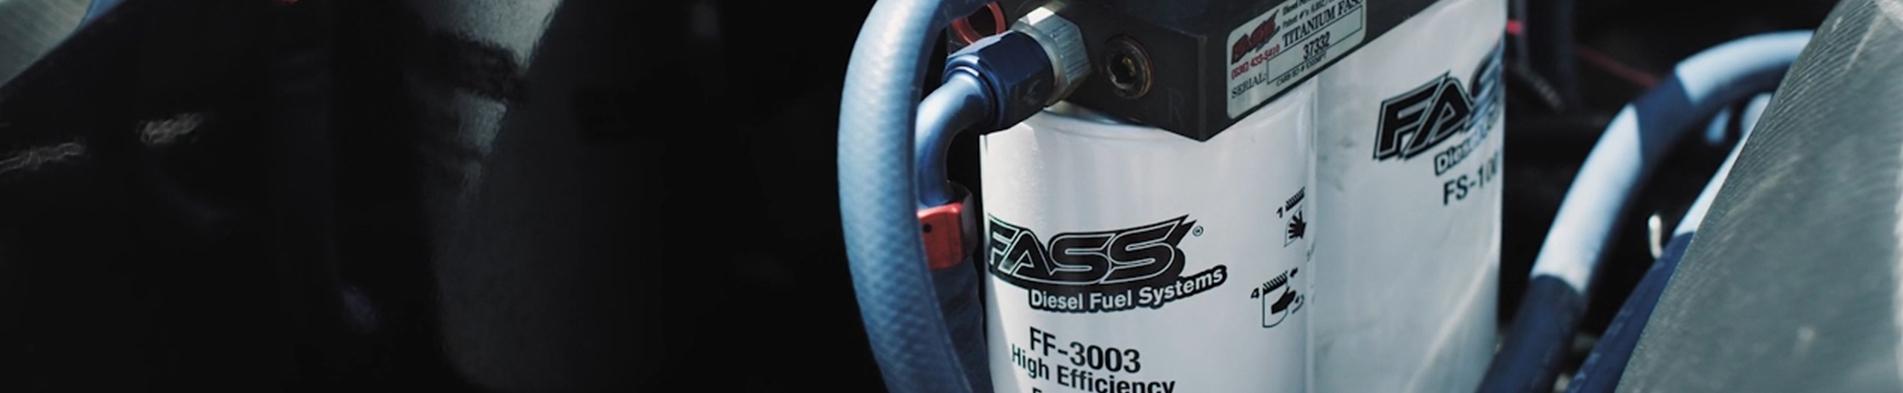 fuel-lift-pumps-banner.jpg